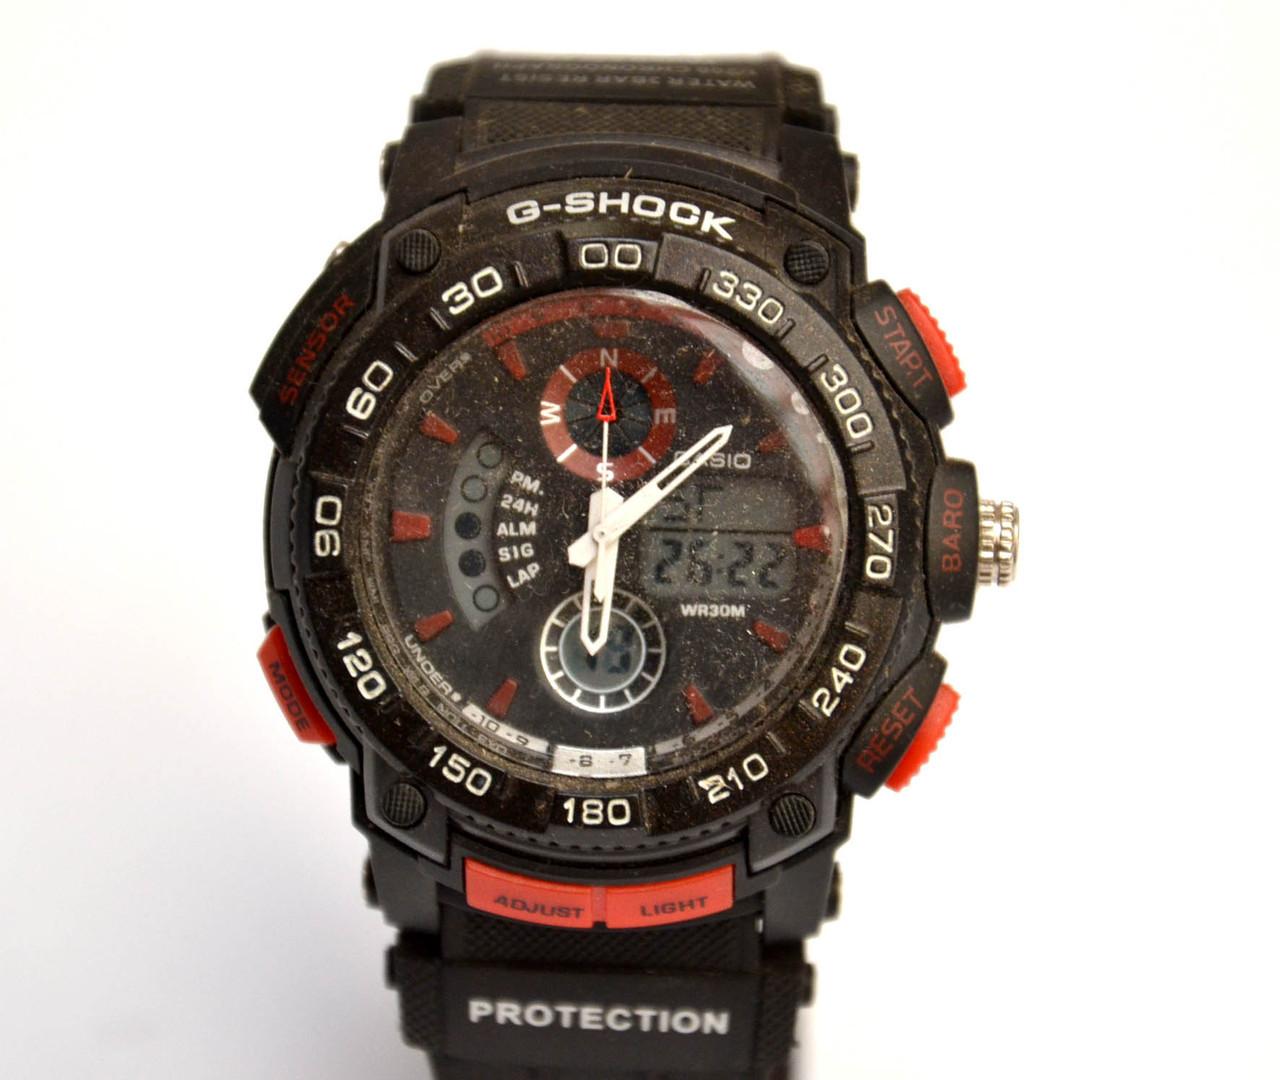 Наручные часы  Protection  черные с красным